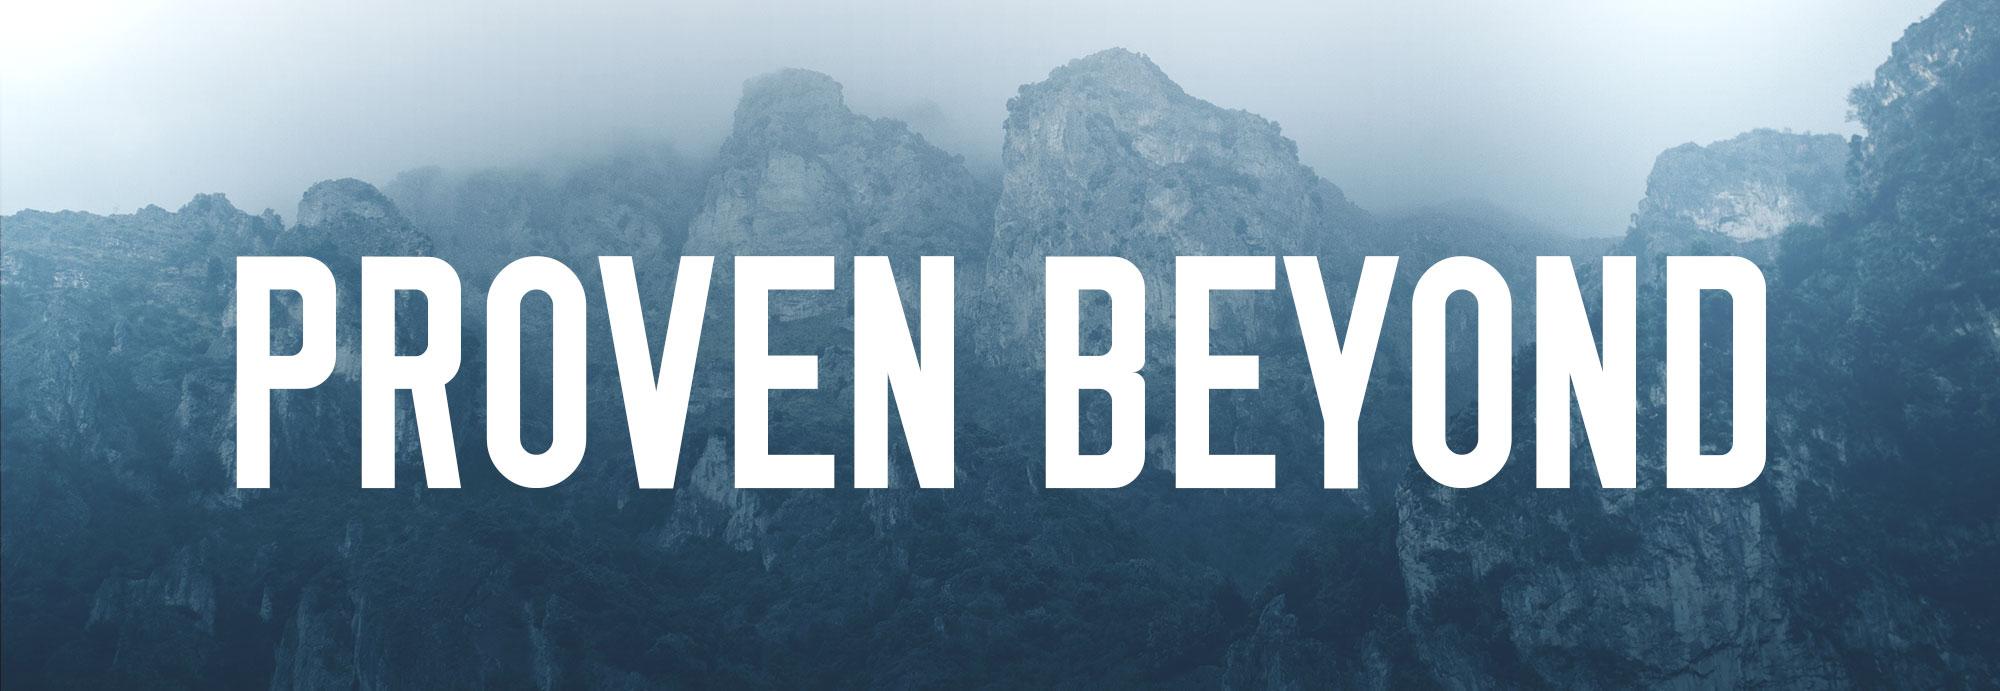 proven-beyond-page-header-bg.jpg